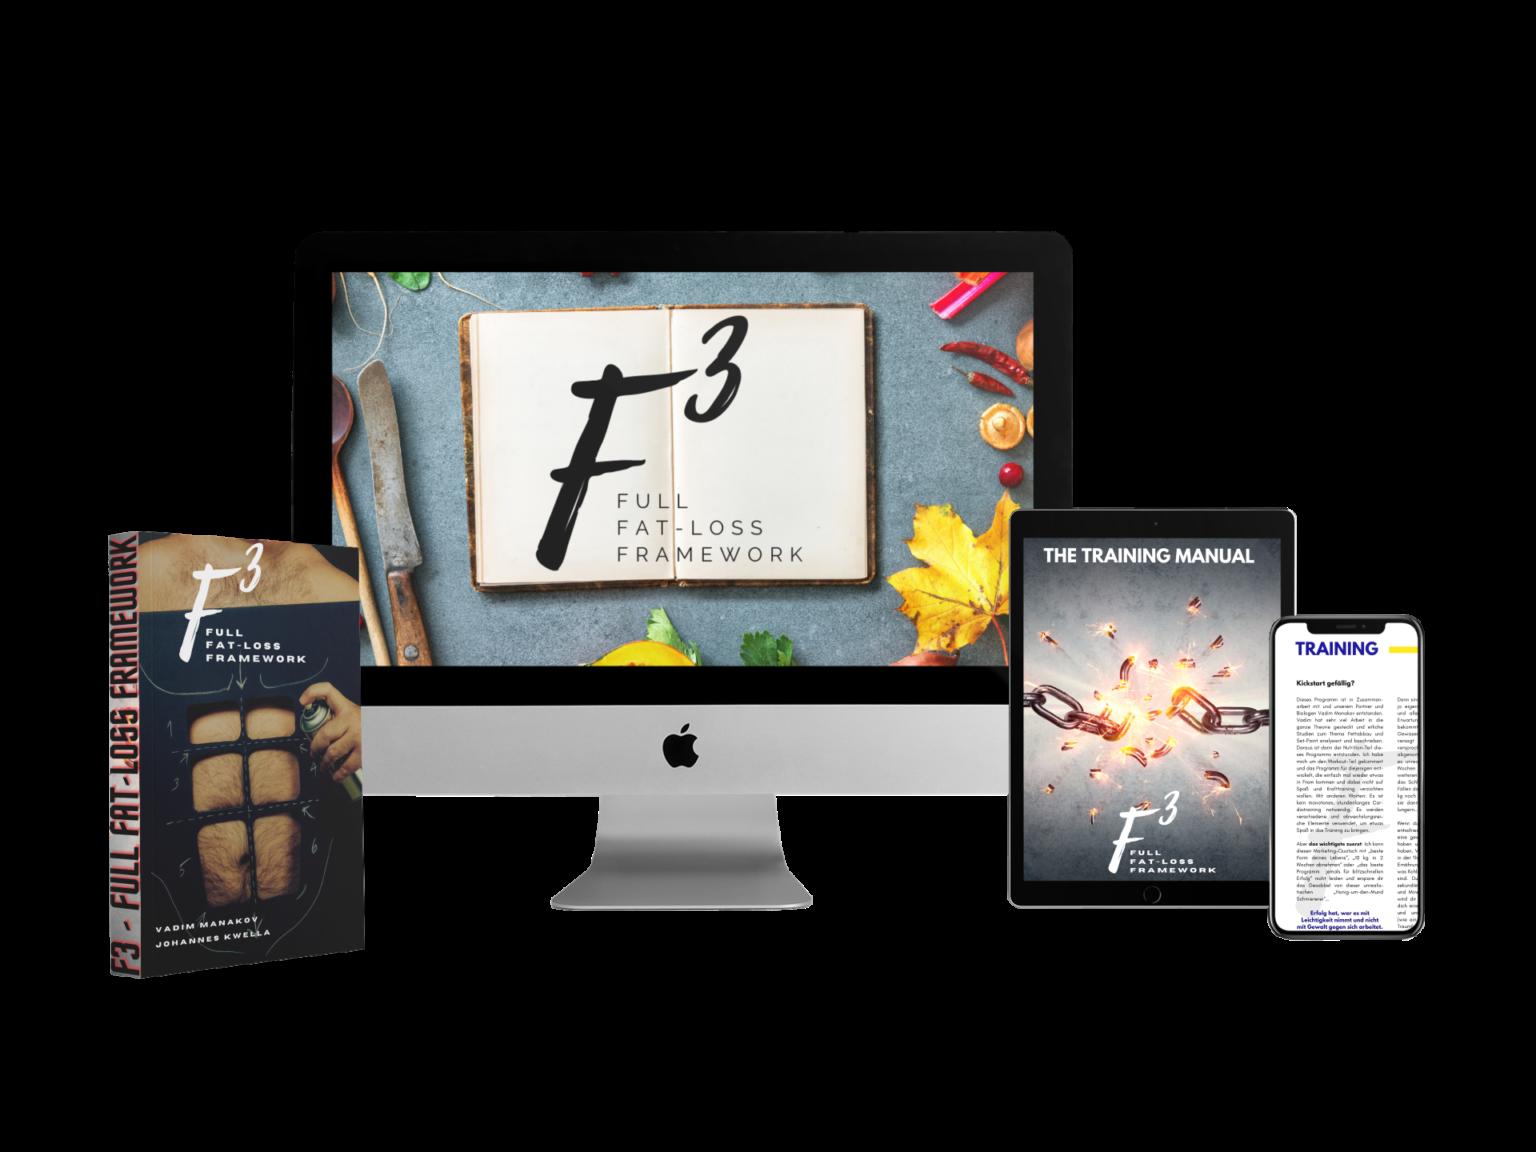 F3 Full Fat-loss Framework